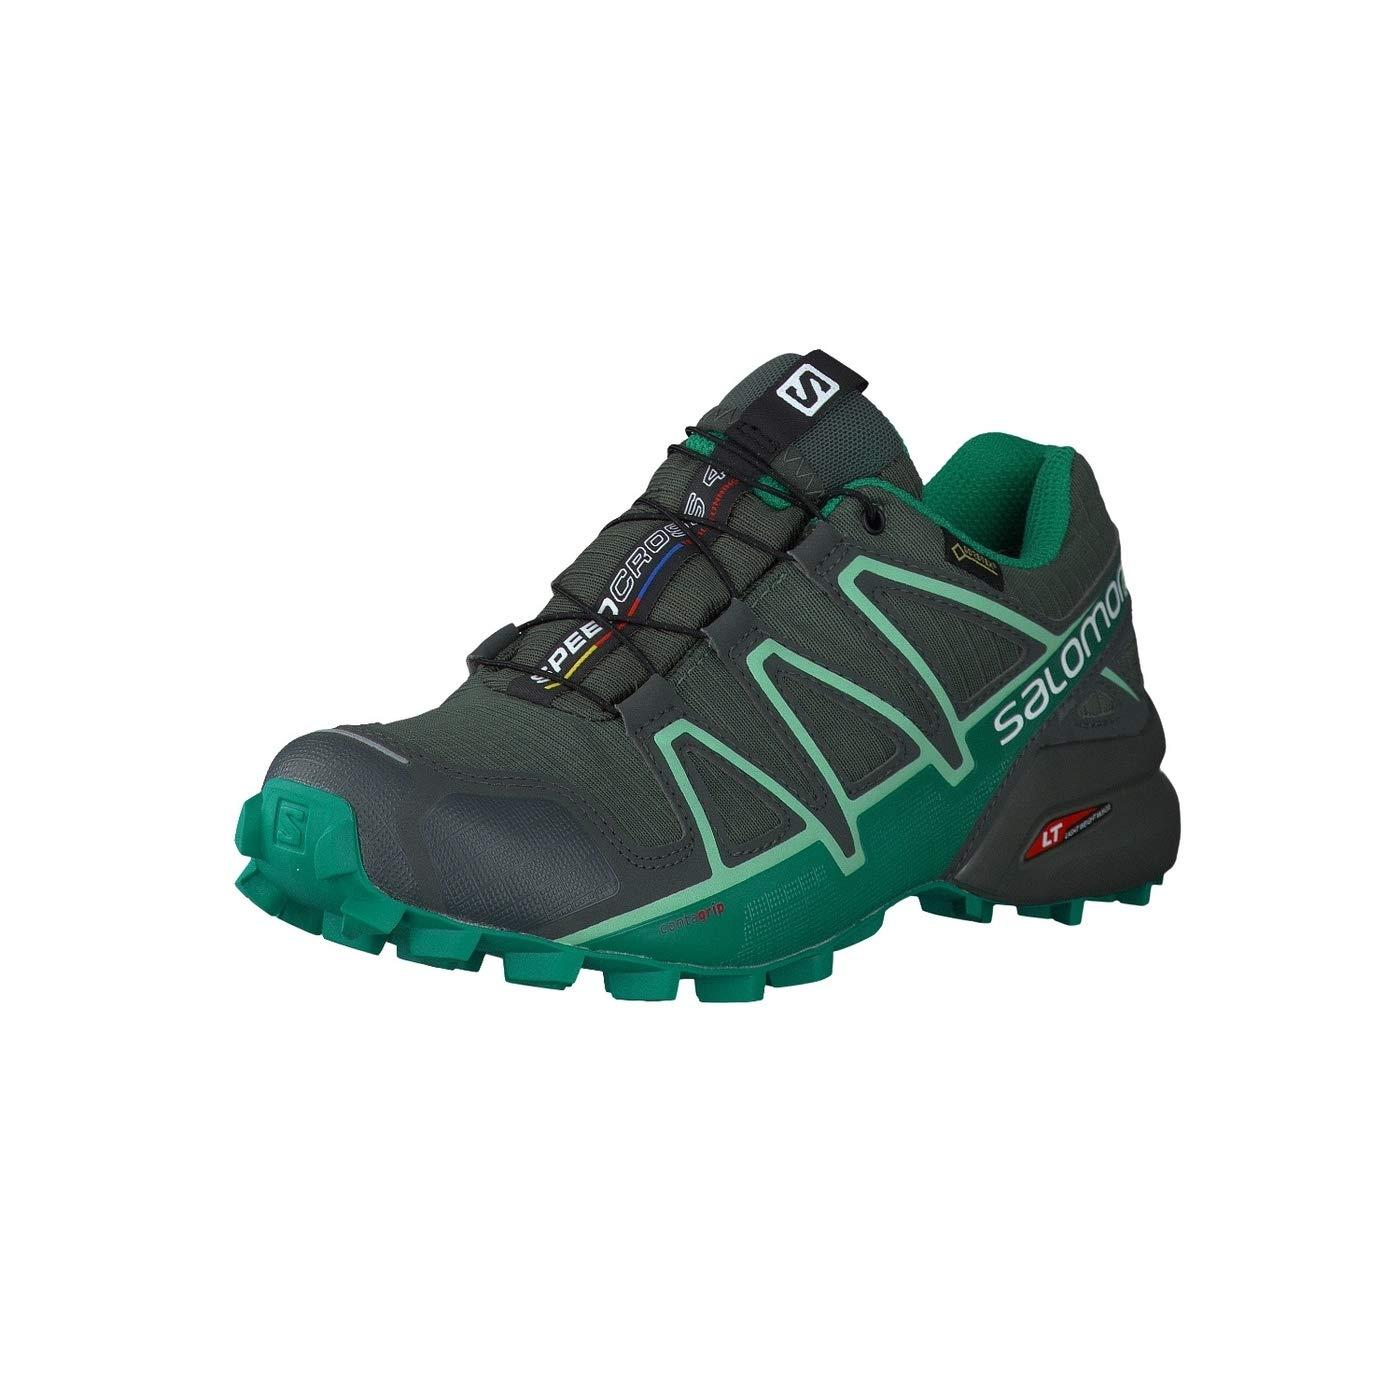 Salomon Damen Speedcross 4 GTX, Trailrunning-Schuhe  | Neues Produkt